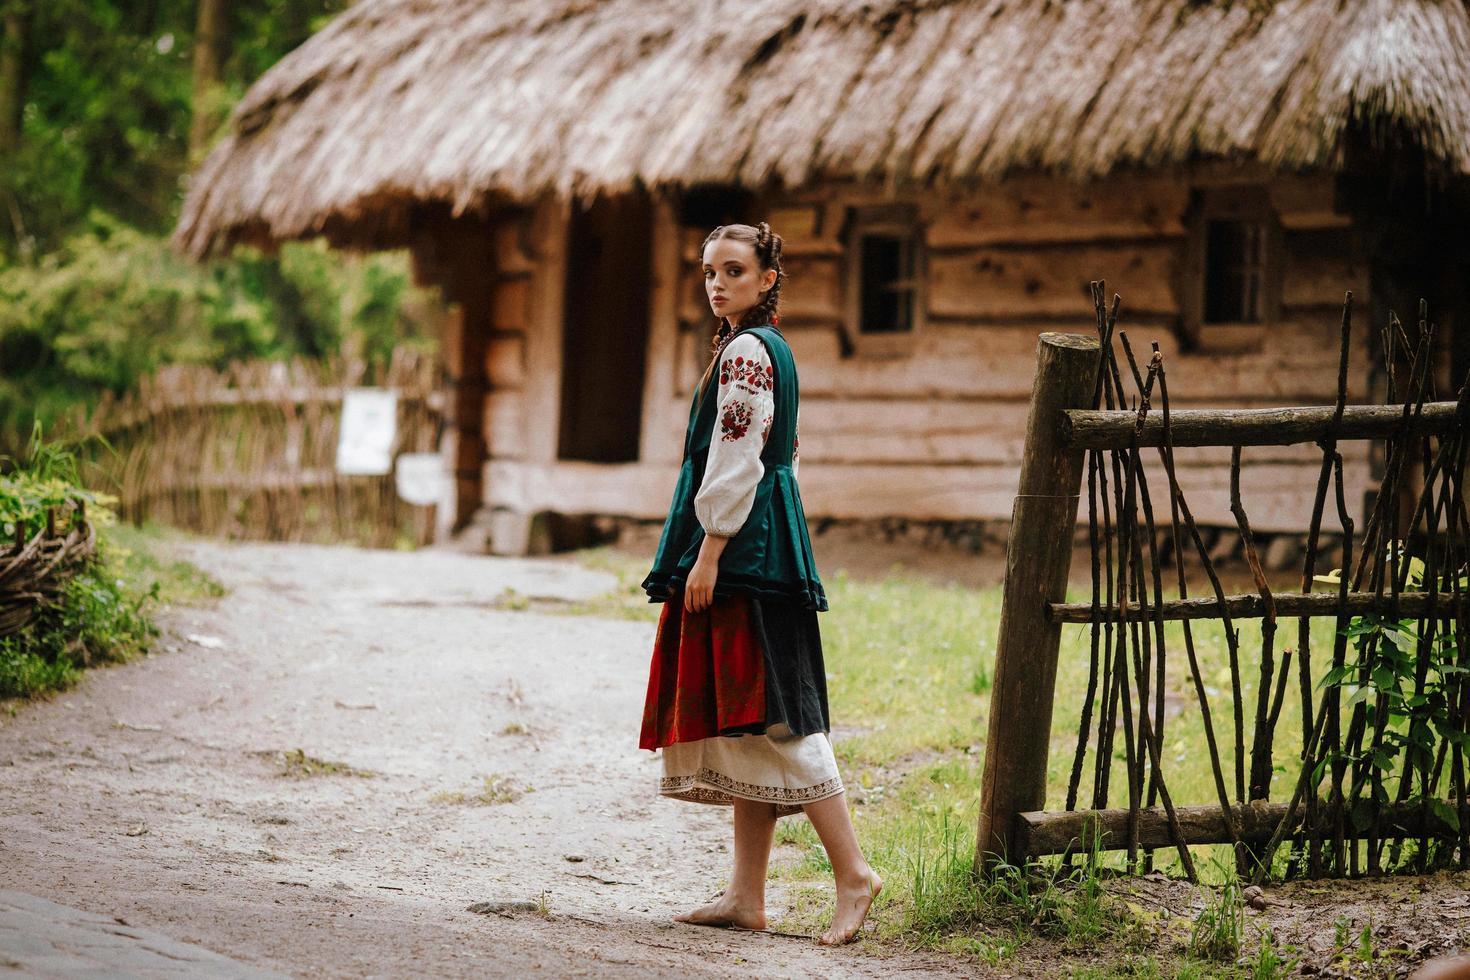 meisje in een geborduurde jurk wandelen in de tuin foto